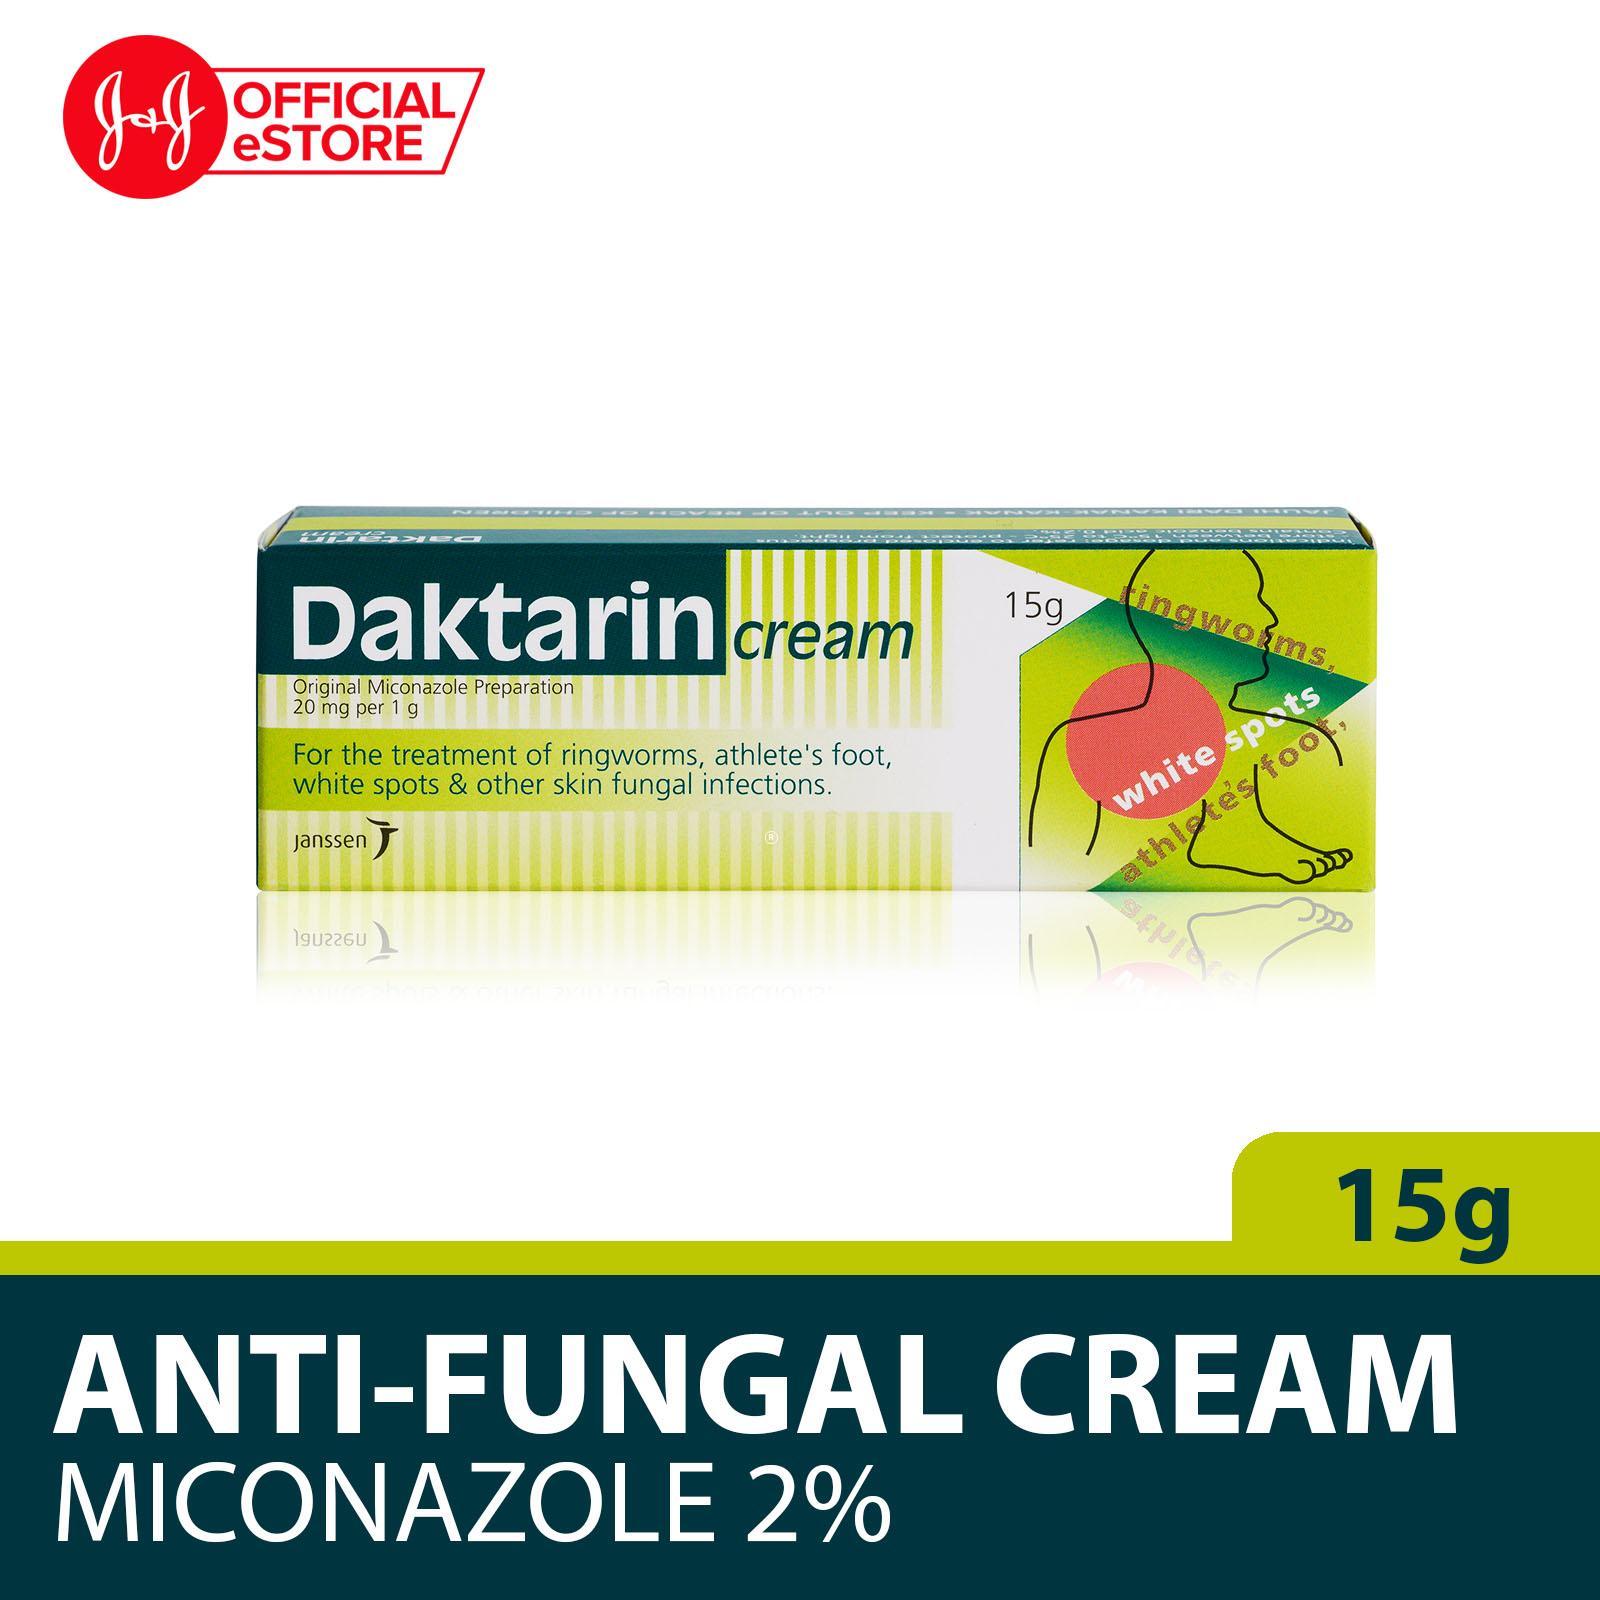 Daktarin Anti-Fungal Cream Miconazole 2% 15g By Johnson & Johnson Official Store.